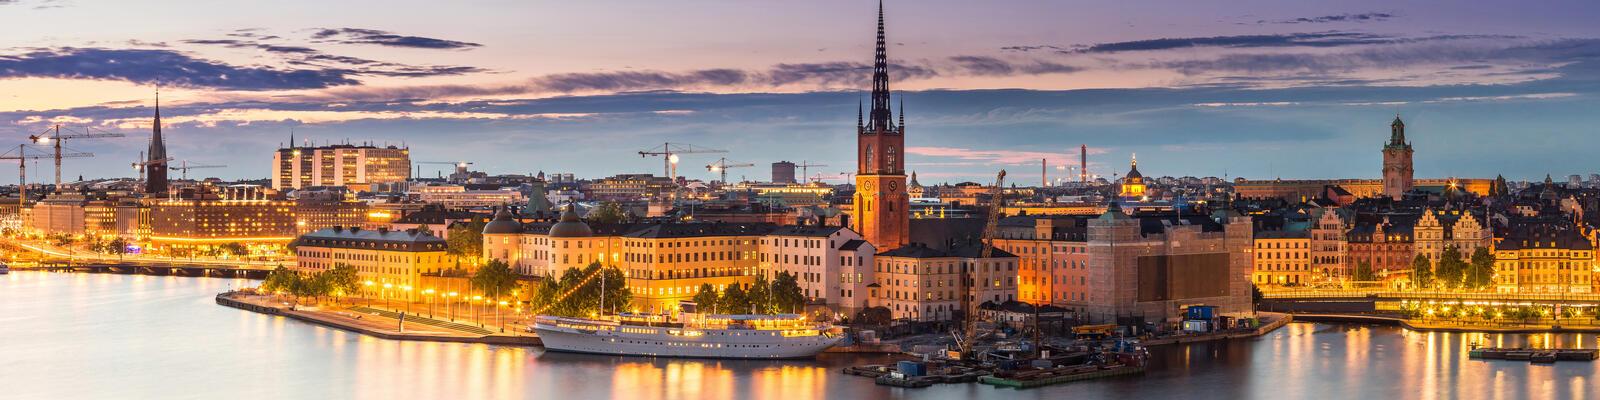 Northern Europe & Baltic Sea - Cruise Critic Community